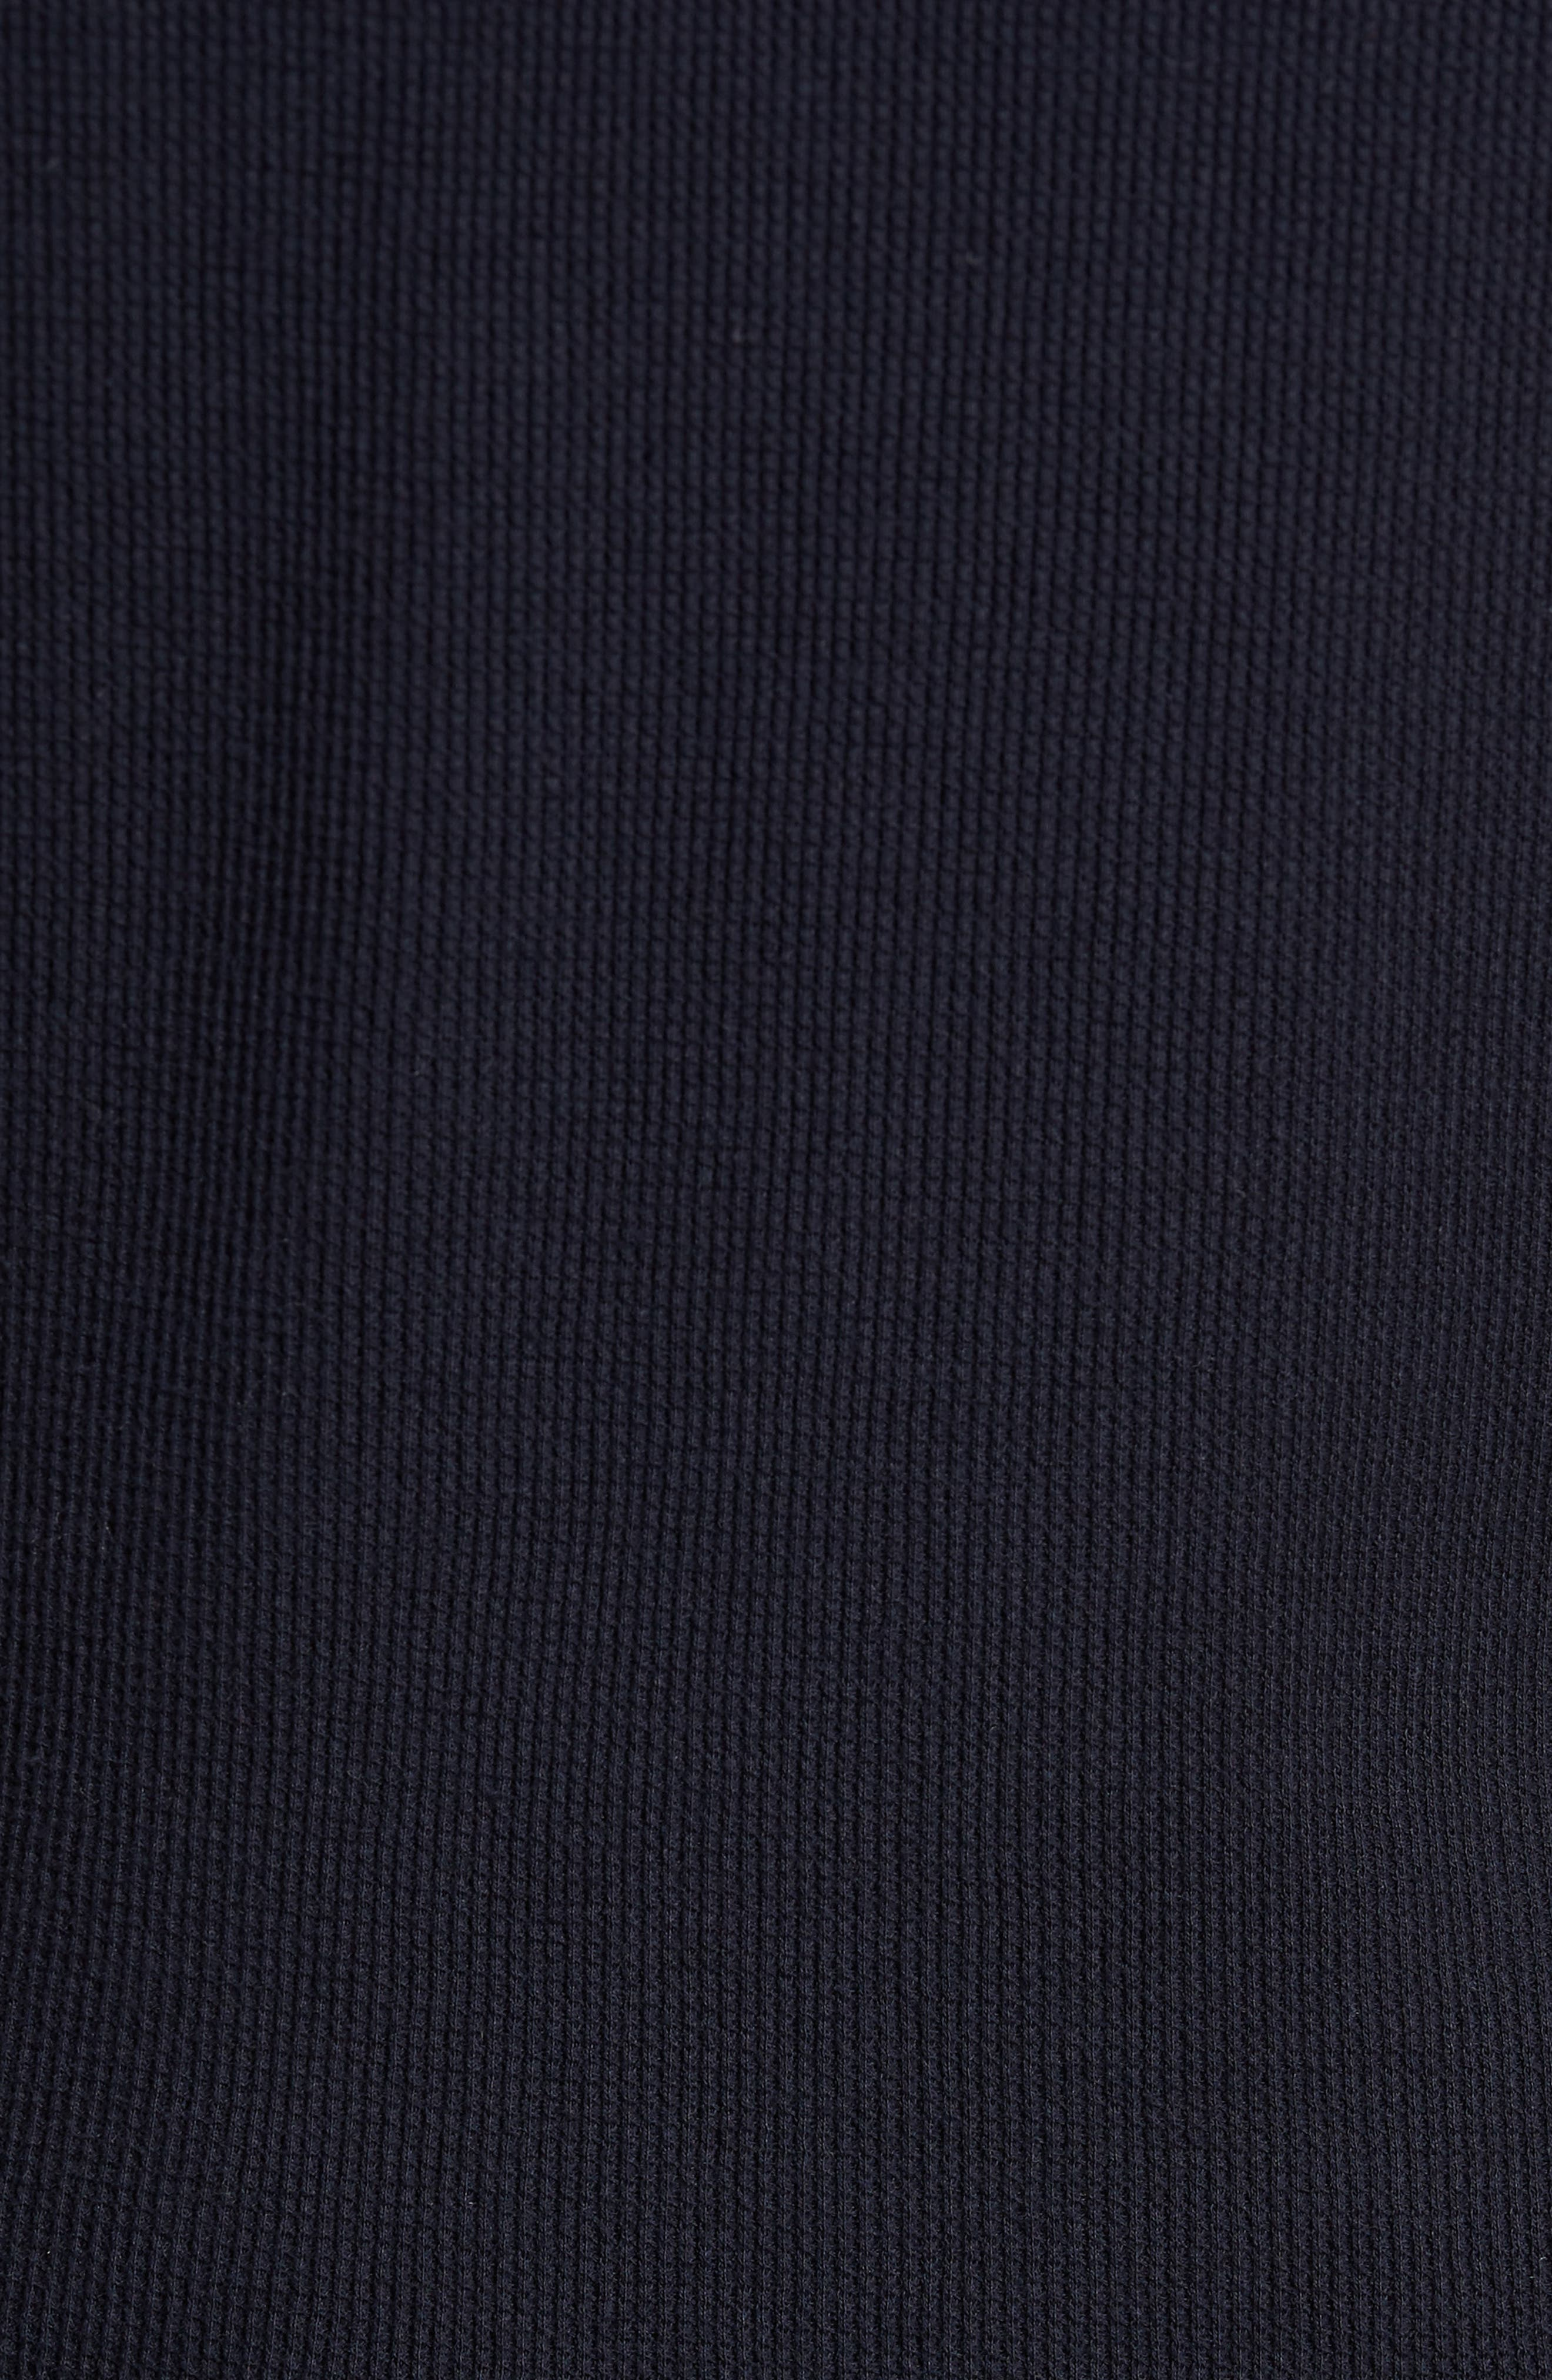 Thermal Knit Long Sleeve T-Shirt,                             Alternate thumbnail 15, color,